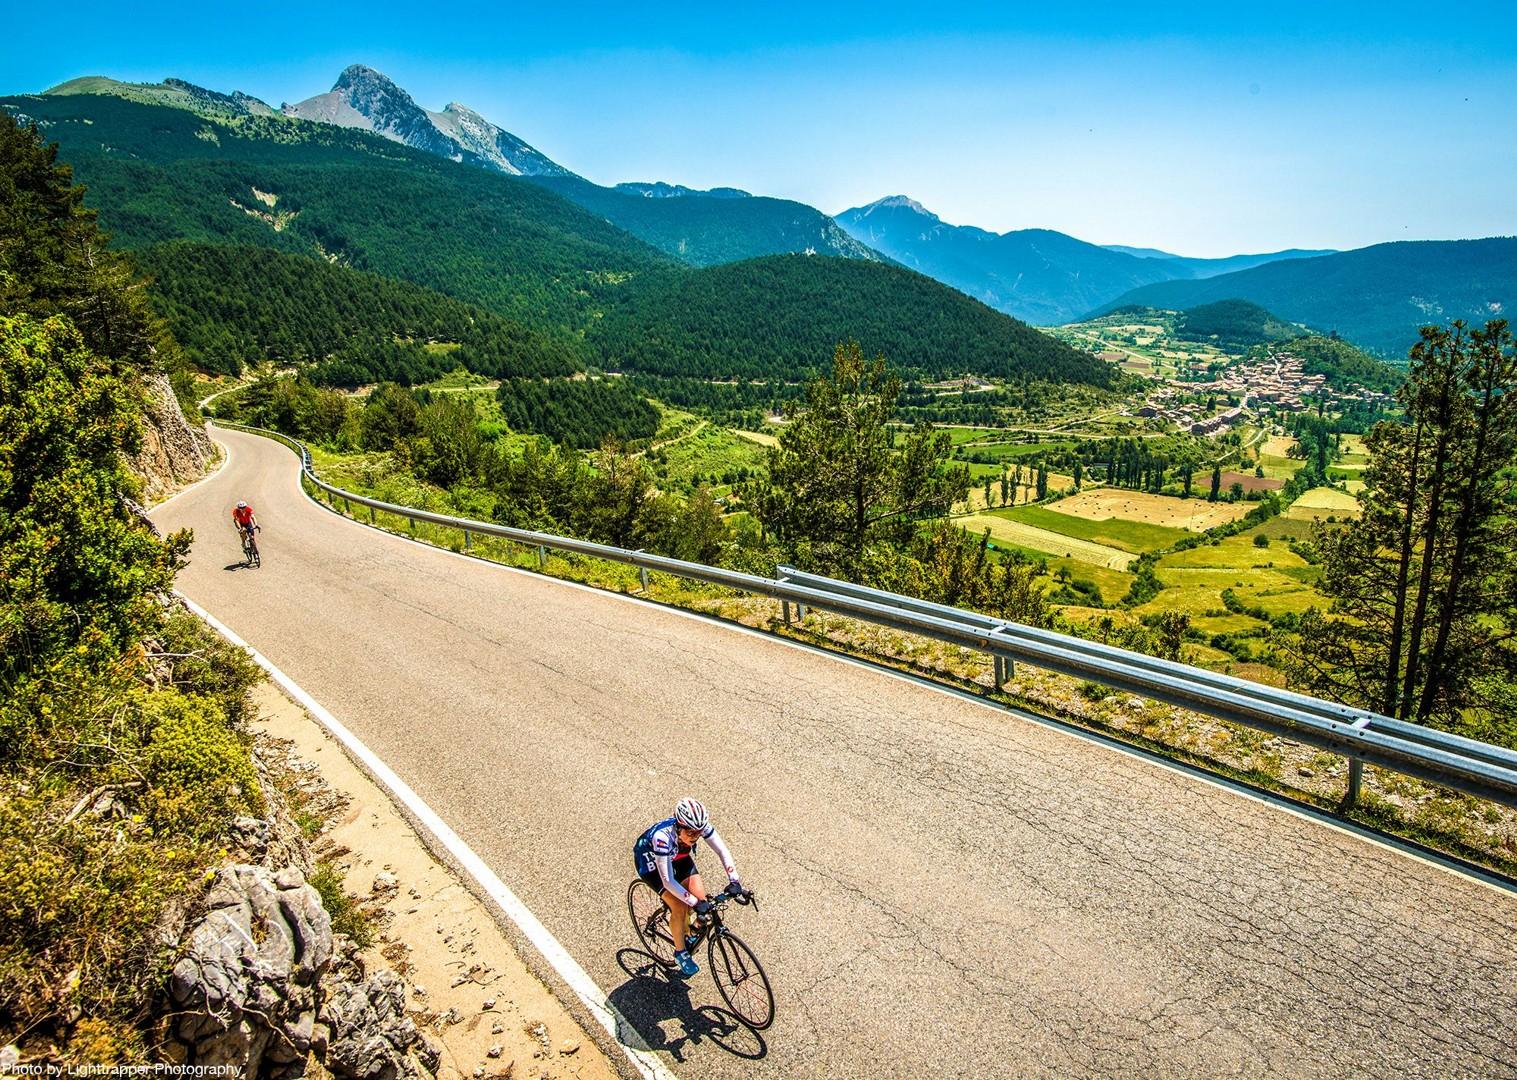 cycling-climb-road-spain-pyrenees-coast-to-coast.jpg - NEW! Spain - Spanish Pyrenees Coast to Coast - Road Cycling